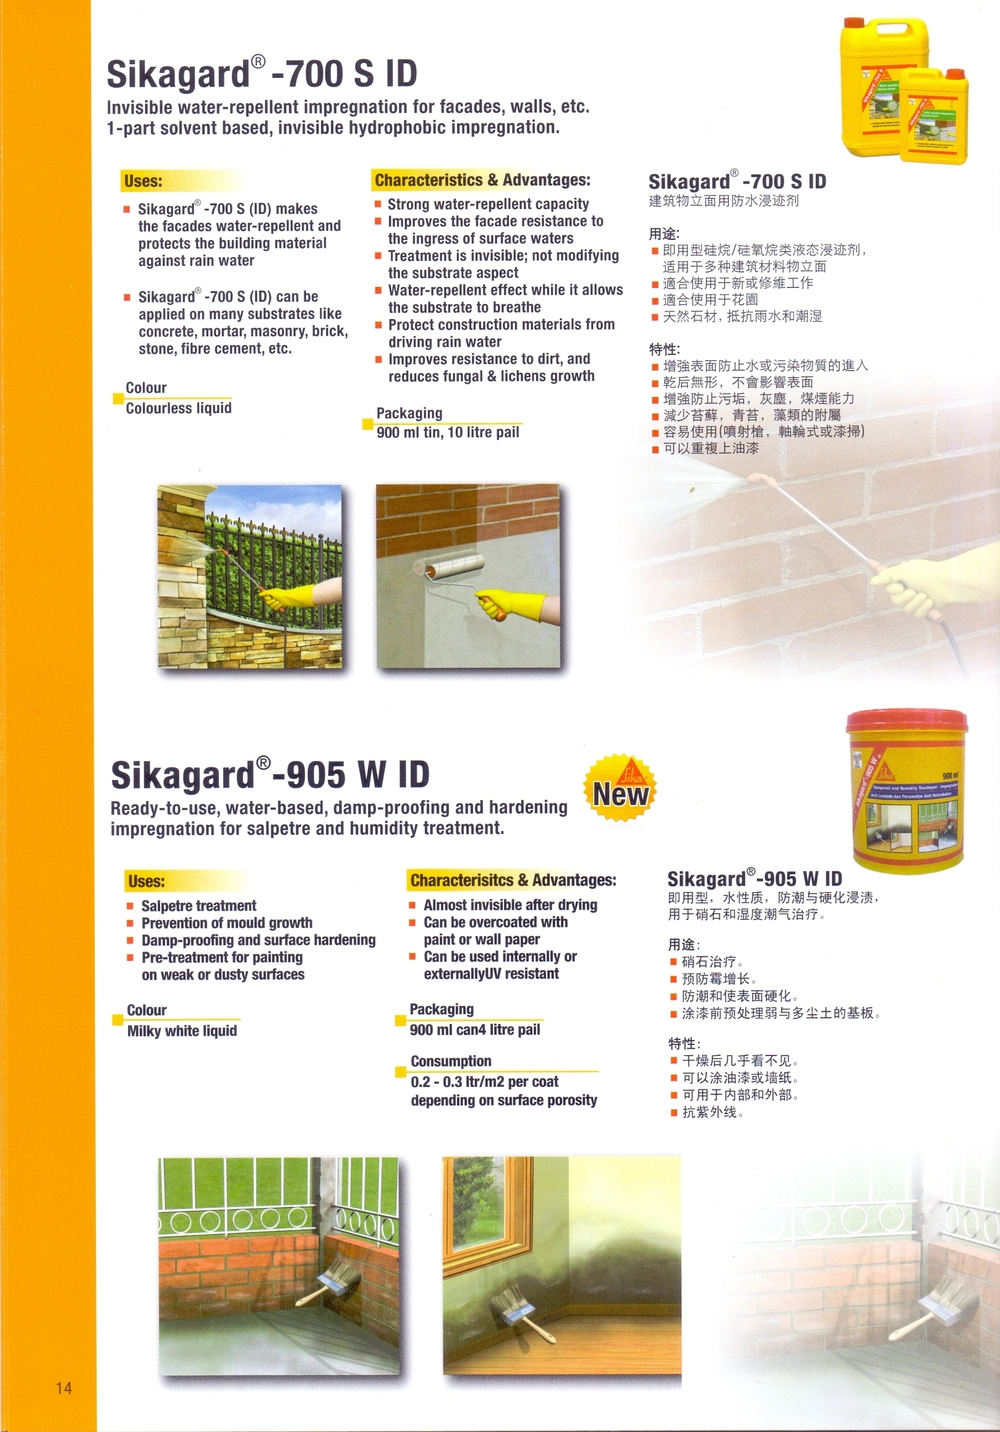 Sikagard - 700 S ID   Sikagard - 905 W ID